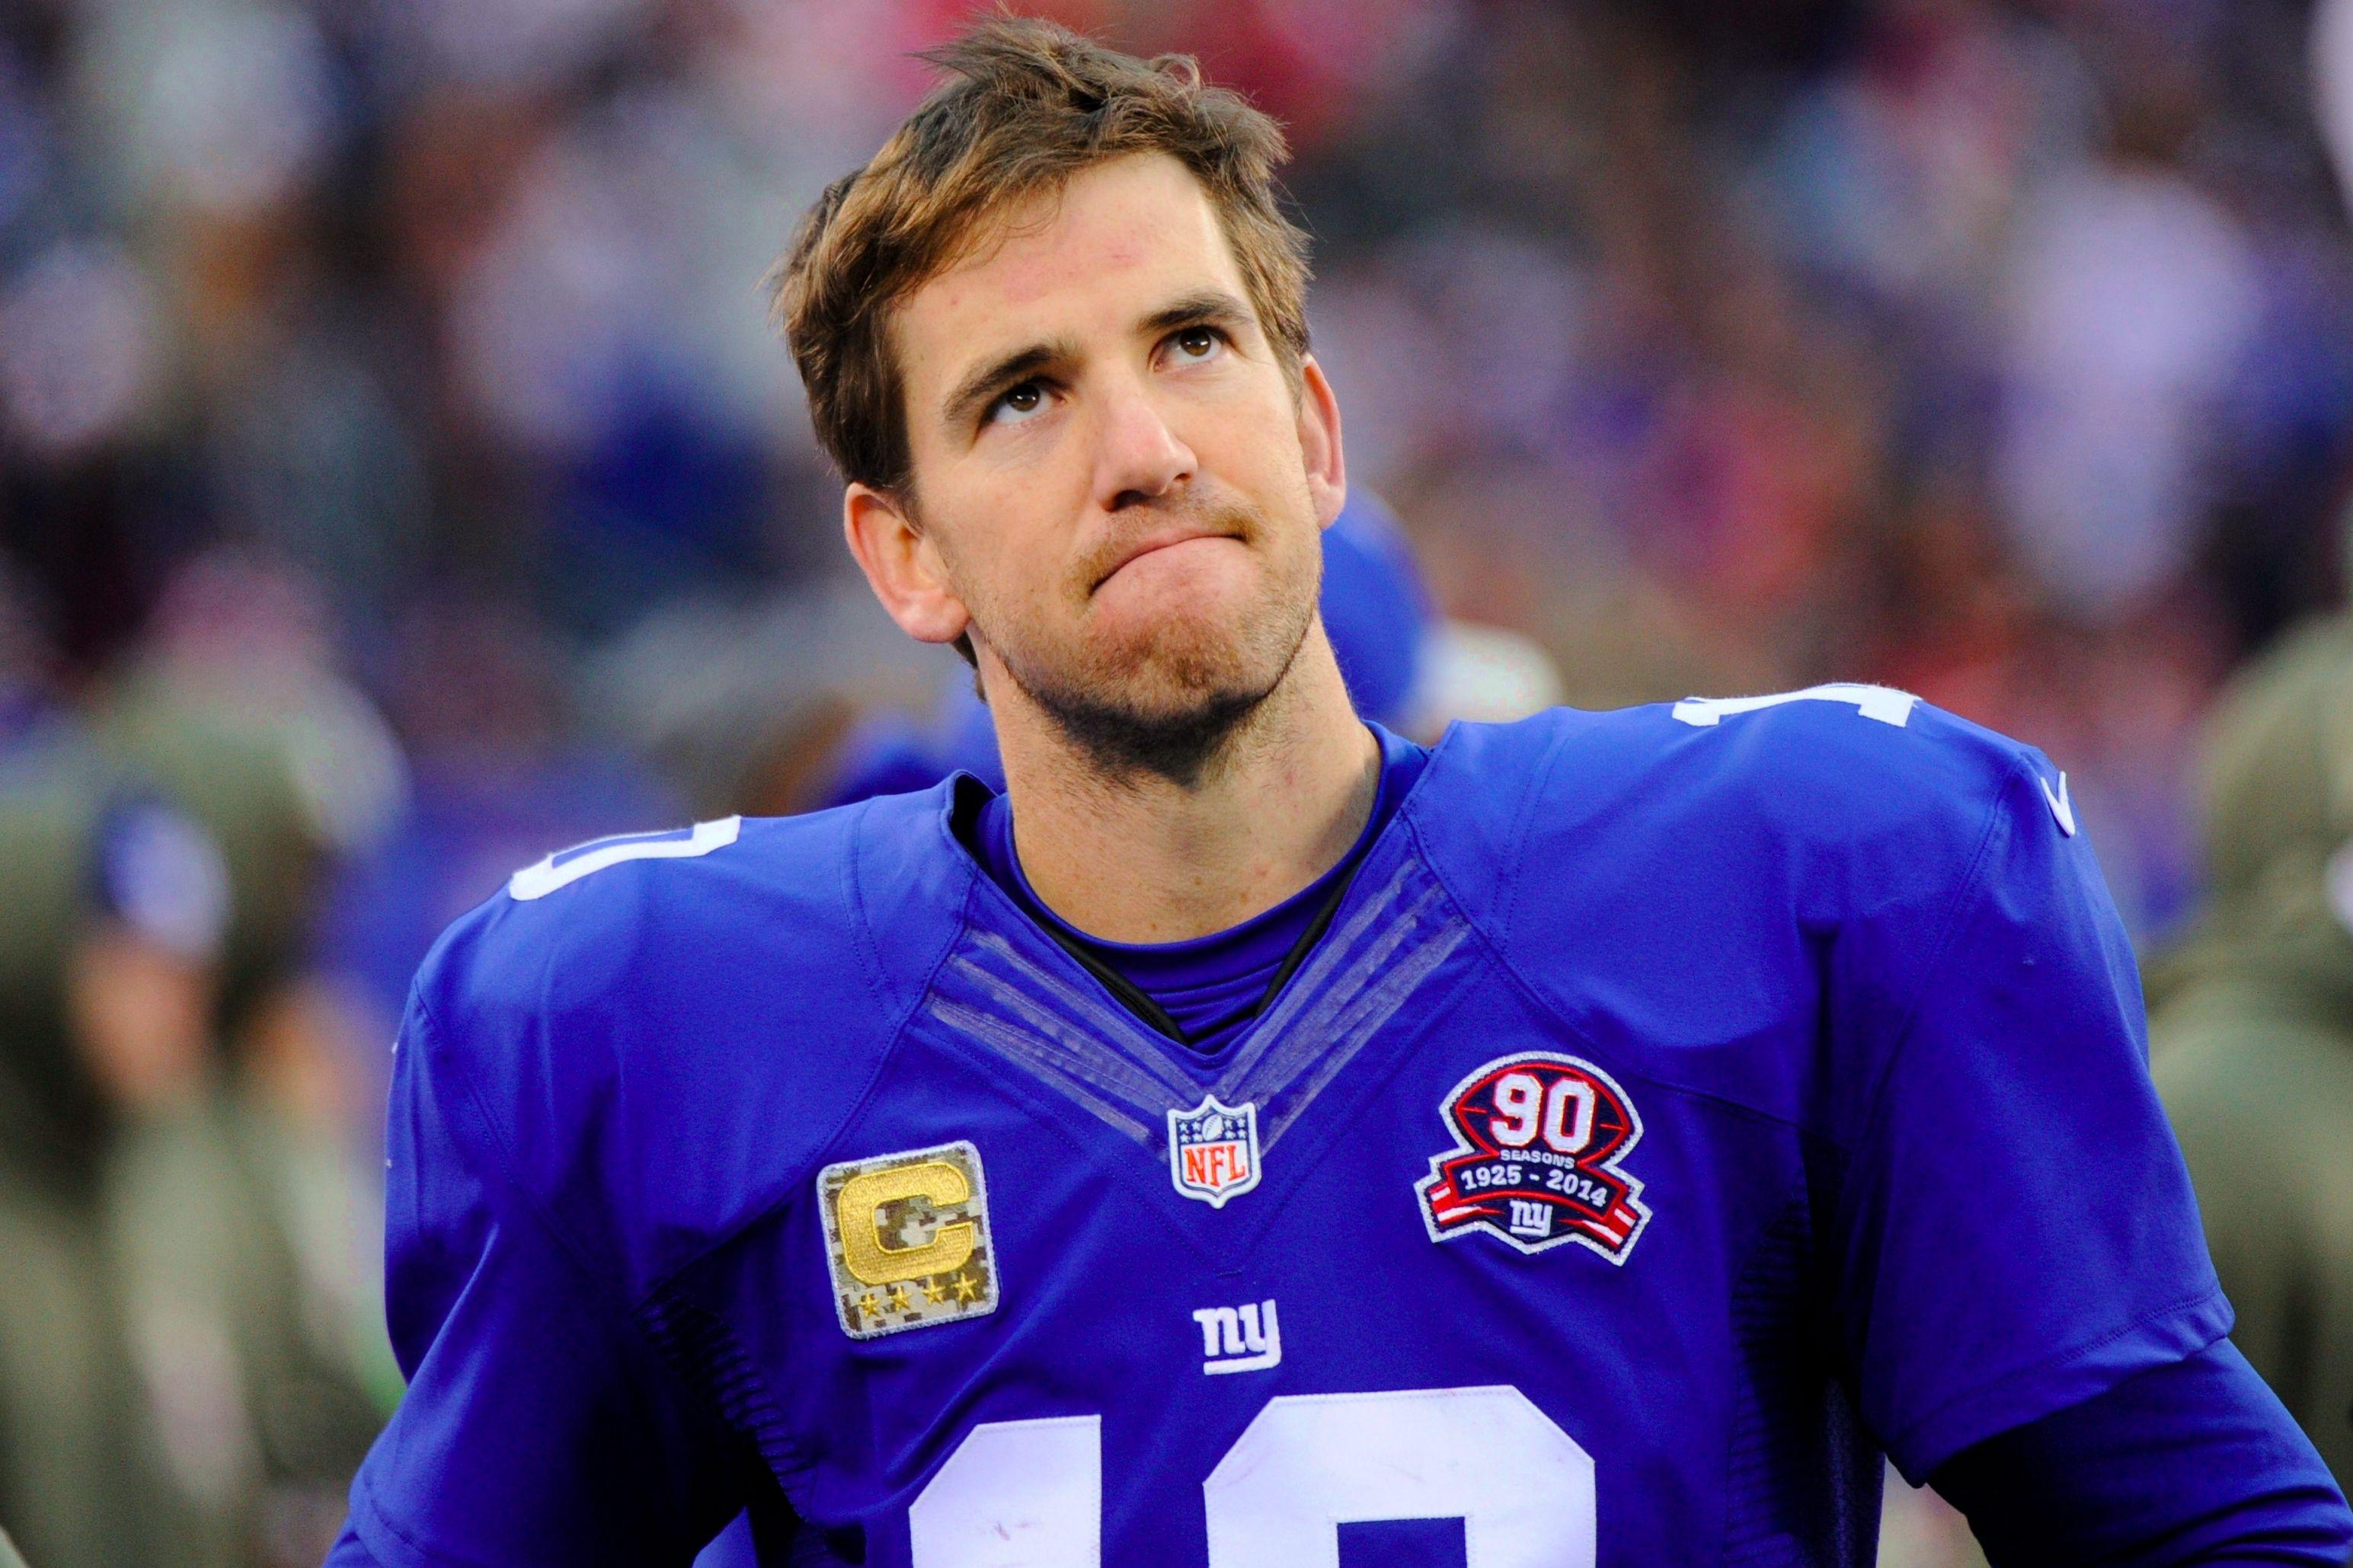 Eli Manning Net Worth - How Rich Is Eli Manning? #EliManningNetWorth